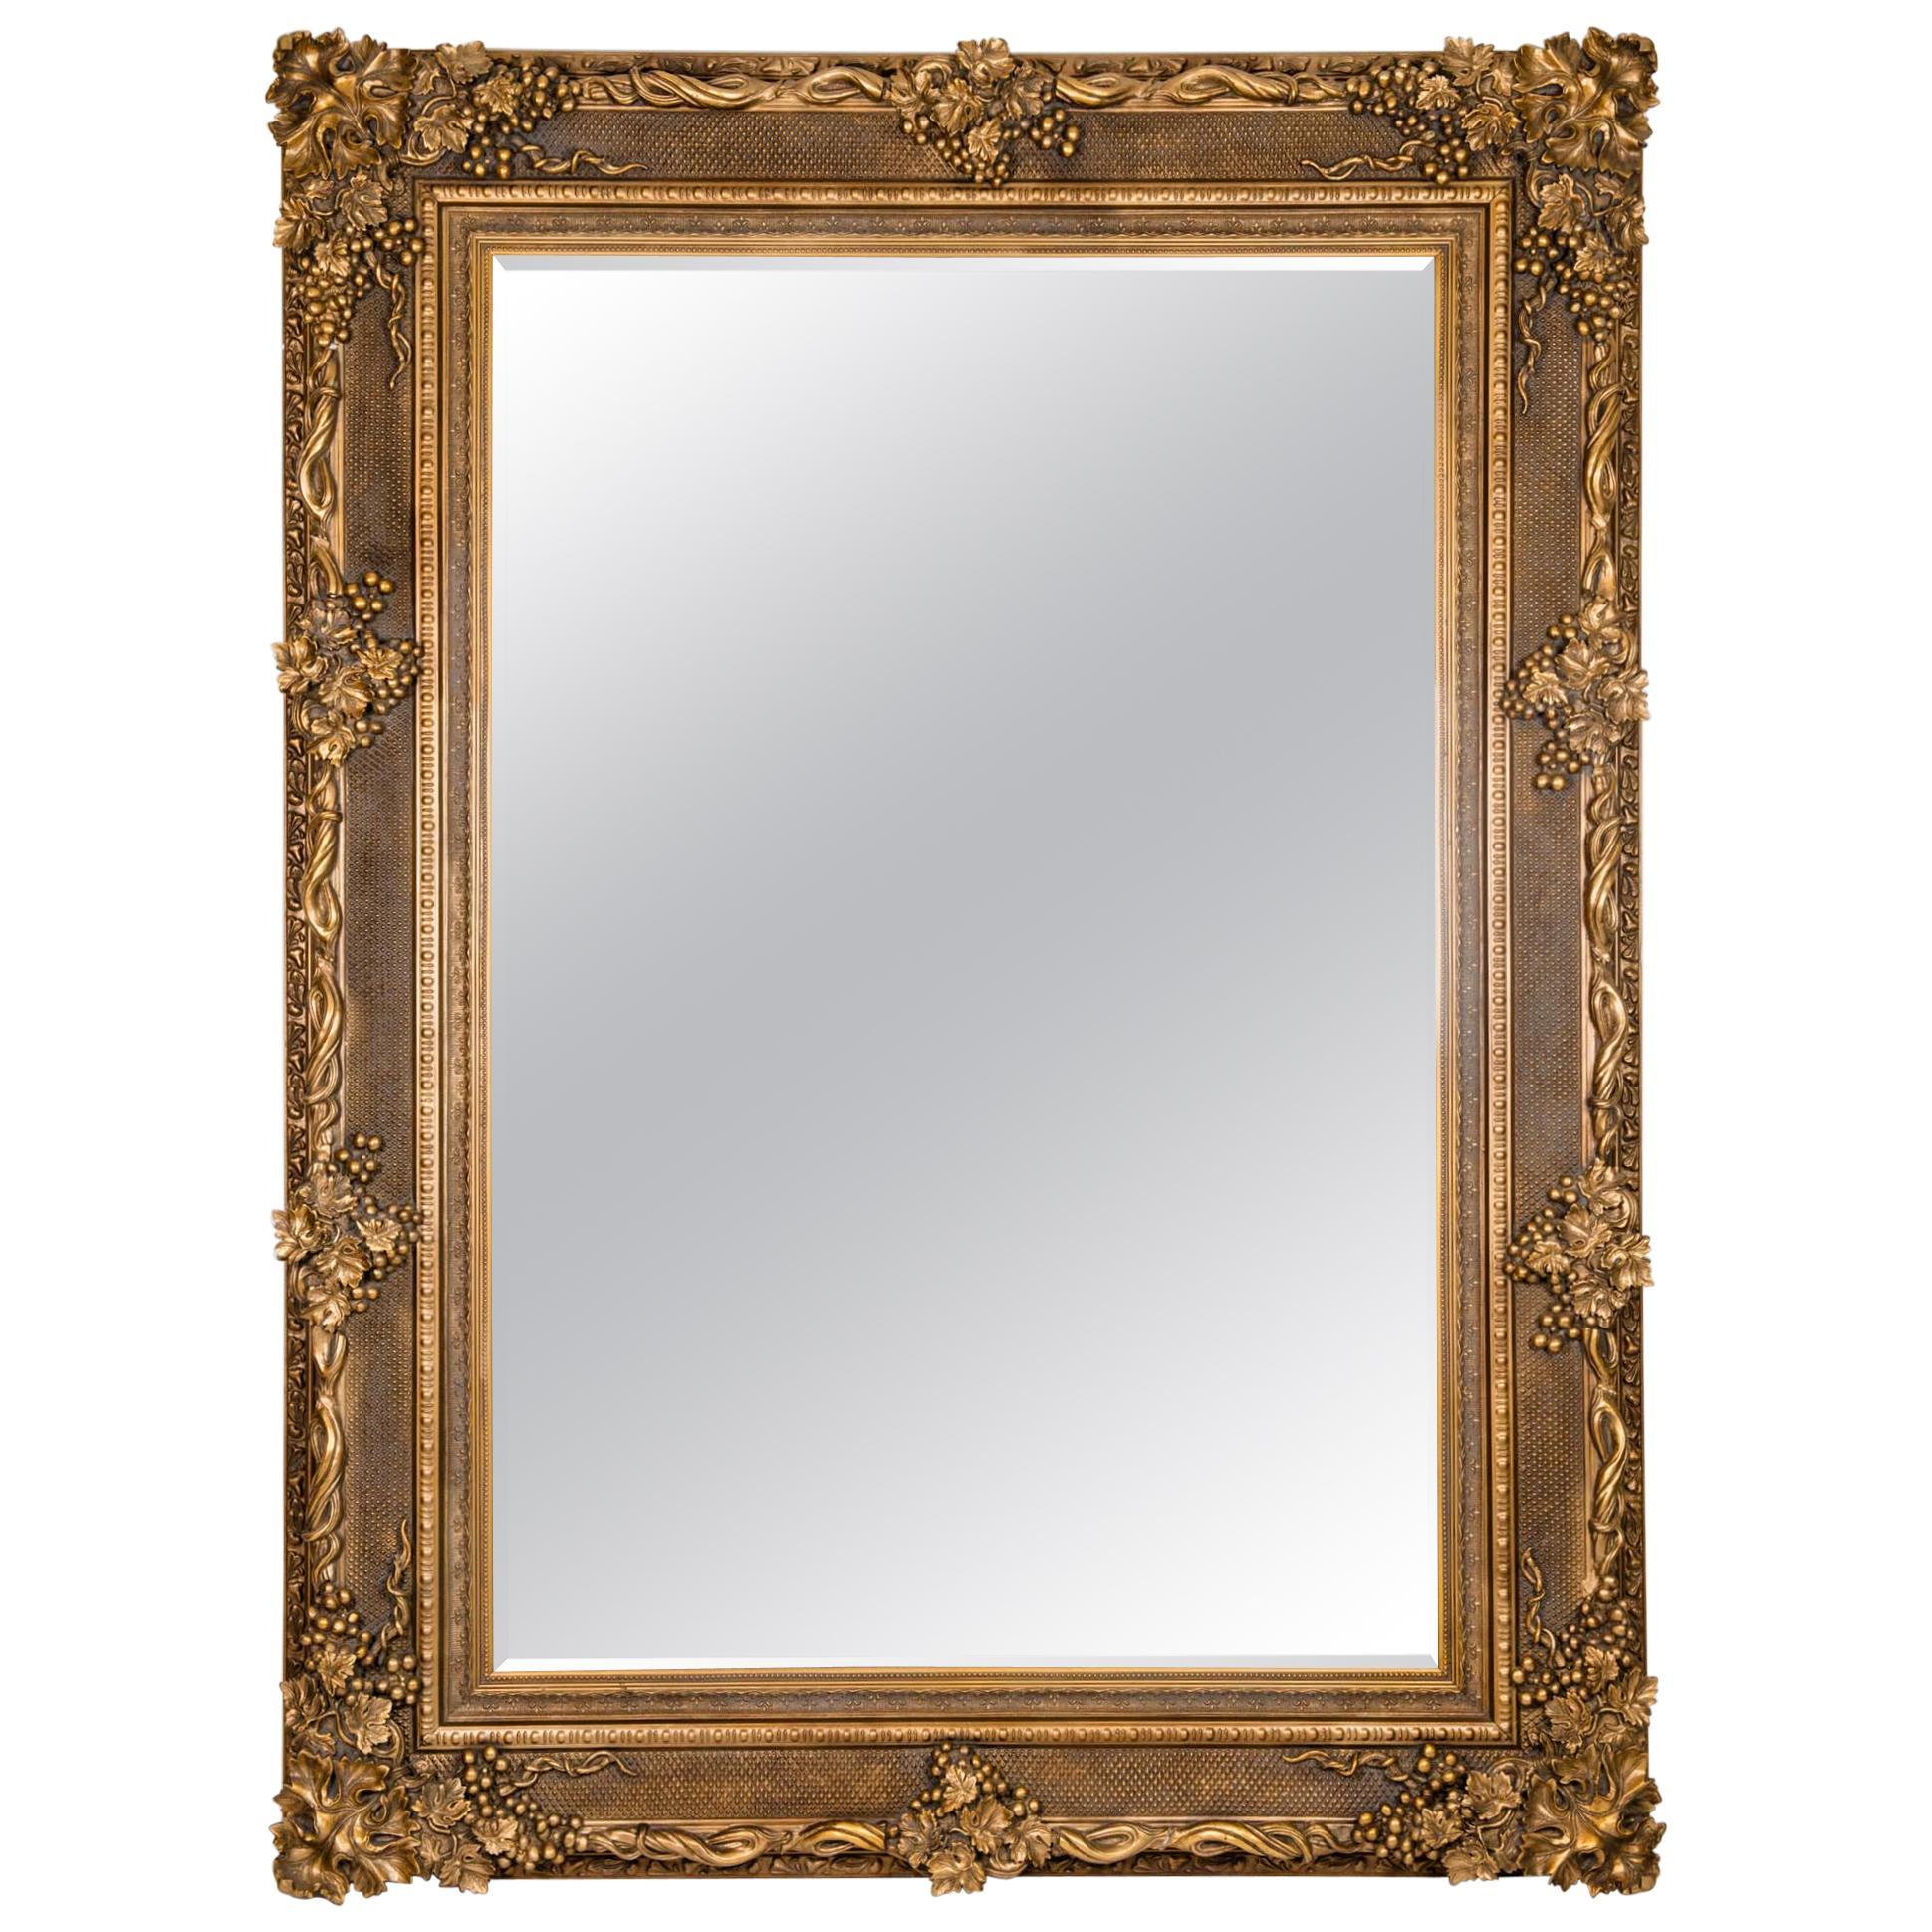 Floor Length Ornately Giltwood Hanging Beveled Wall Mirror